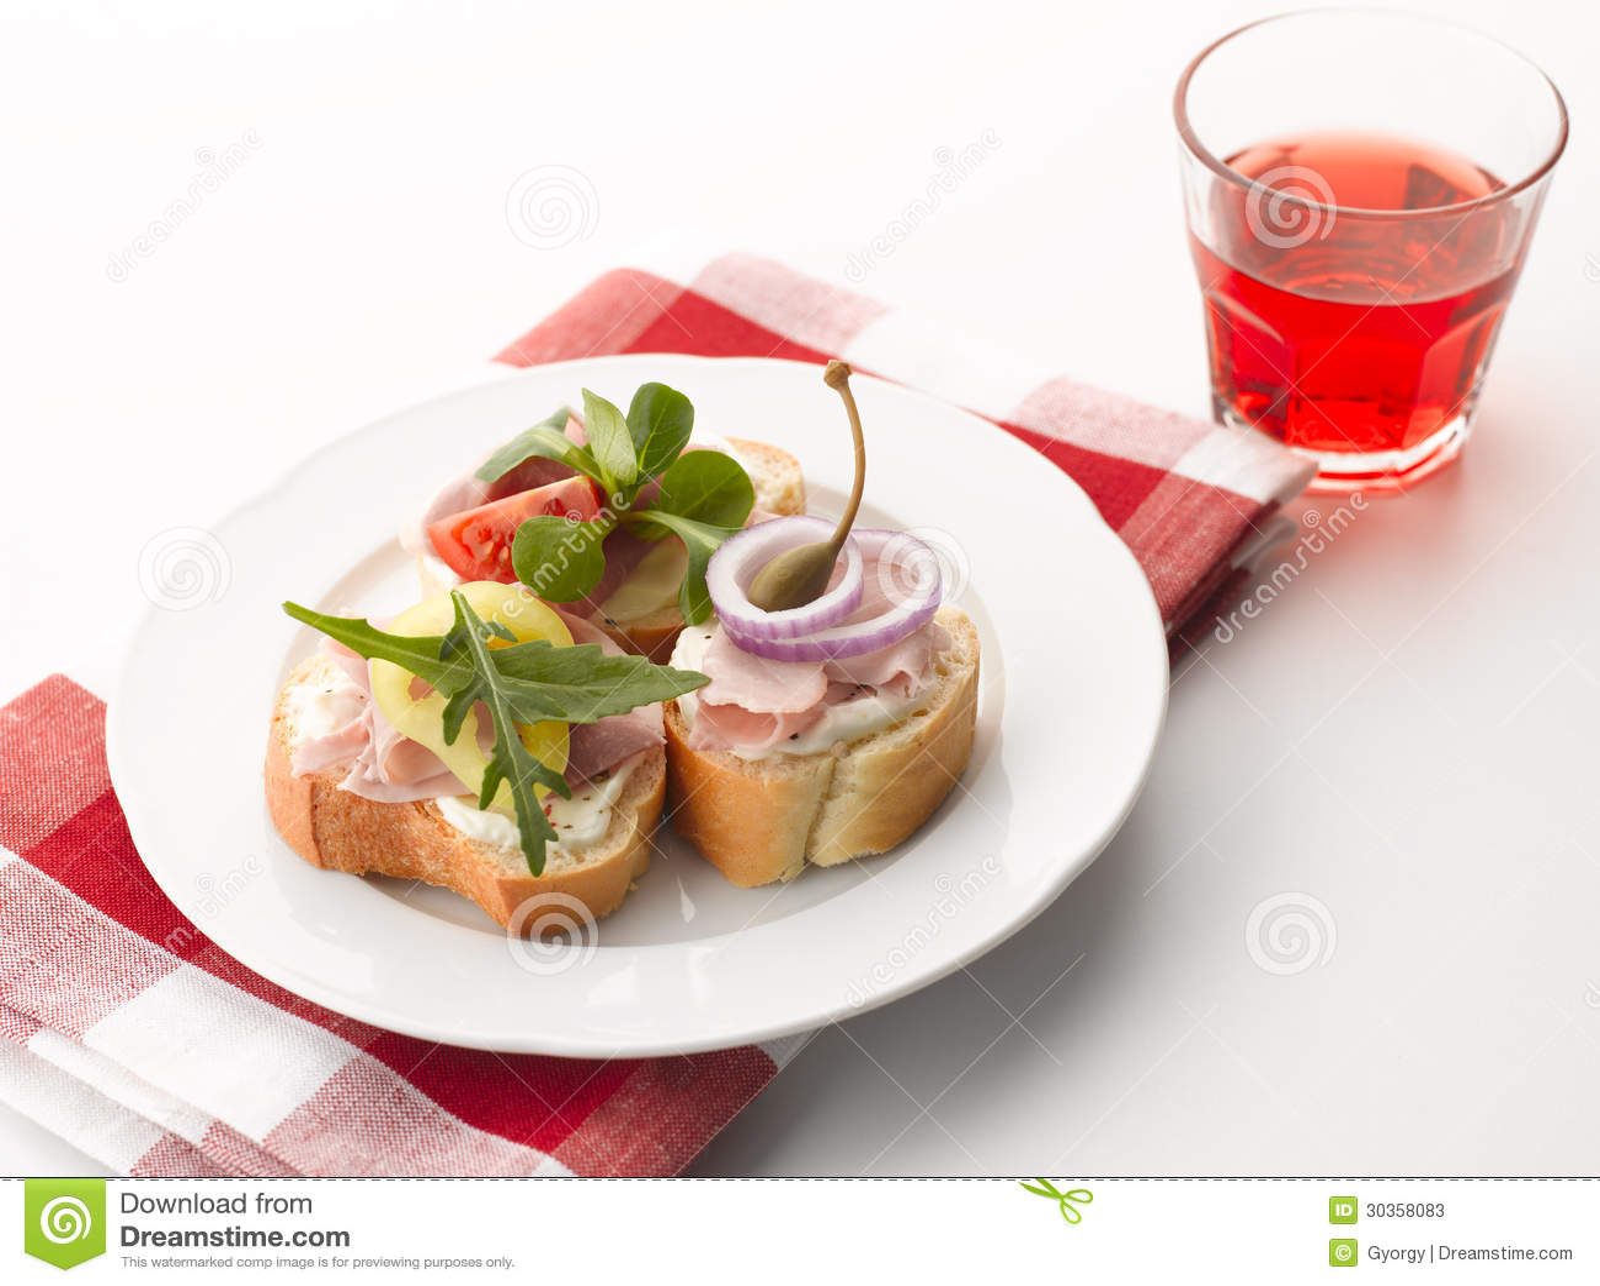 Turkey ham canapes stock photos image 30358083 for Canape sandwich